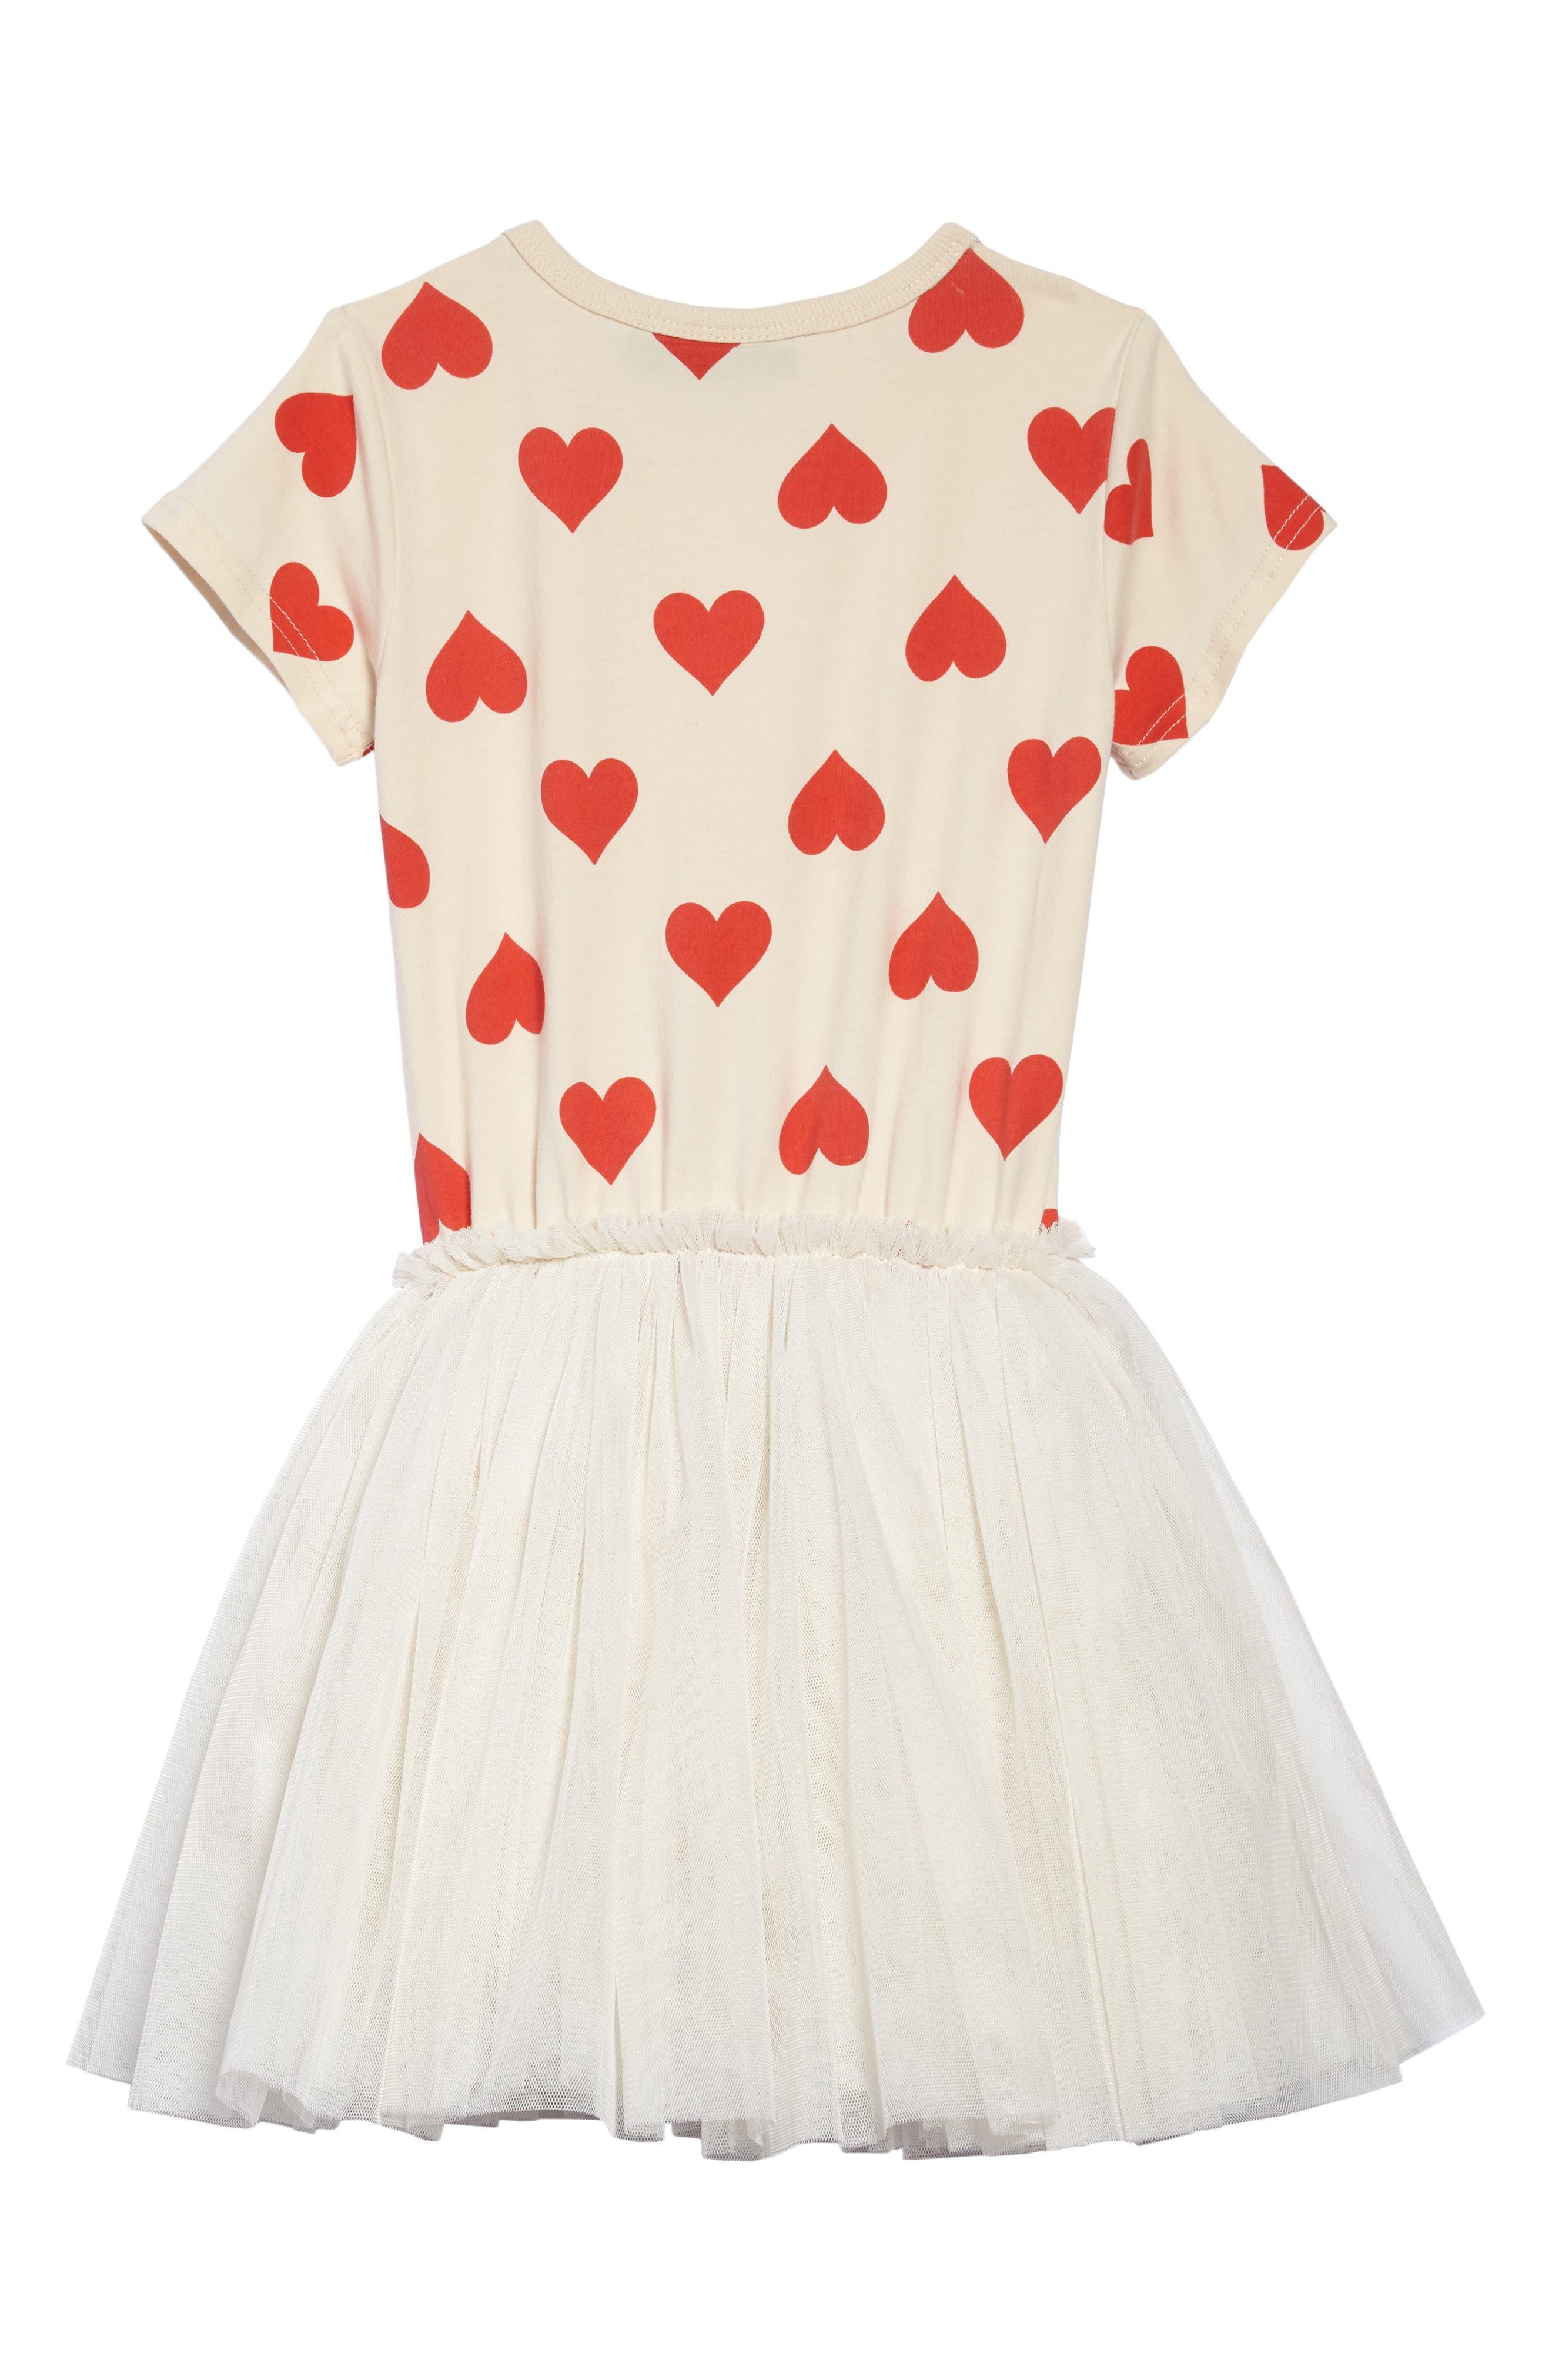 Sweetheart Circus Dress,                             Alternate thumbnail 2, color,                             Oatmeal